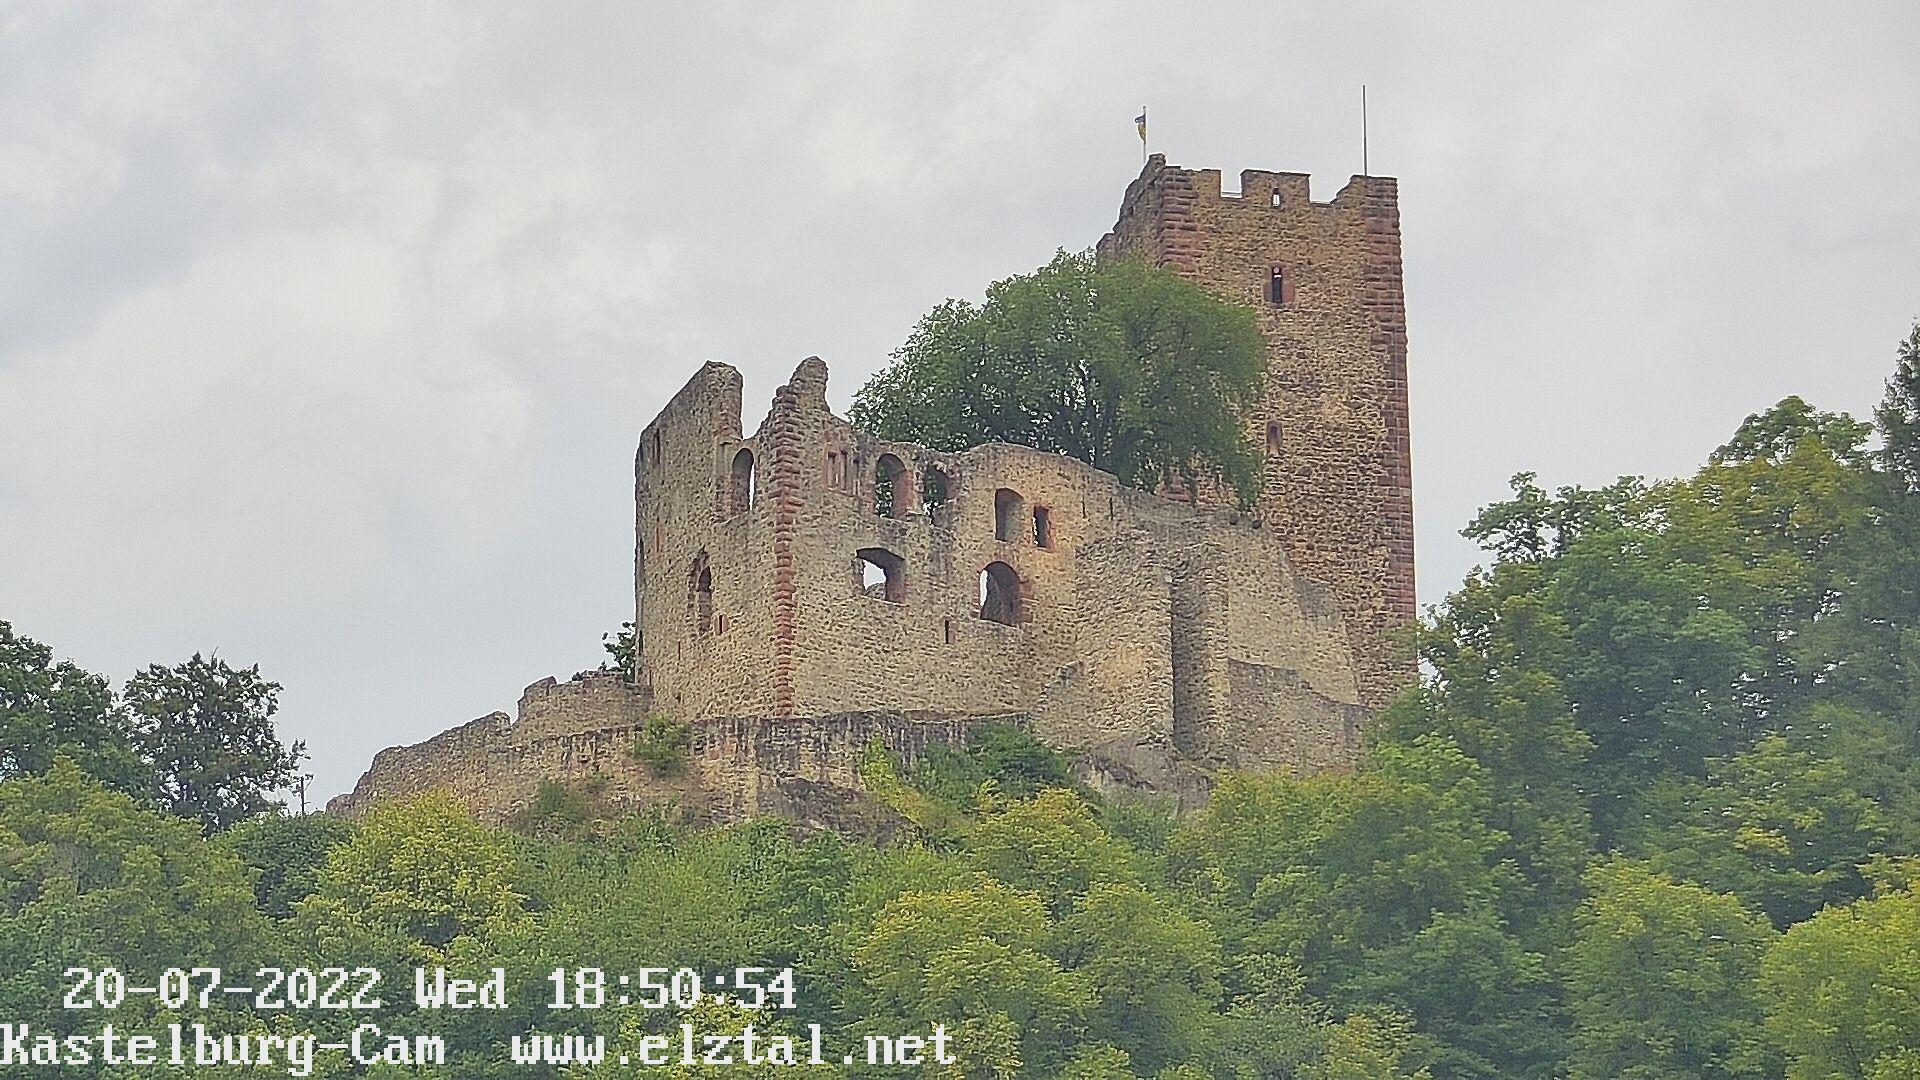 Waldkirch Wed. 18:55